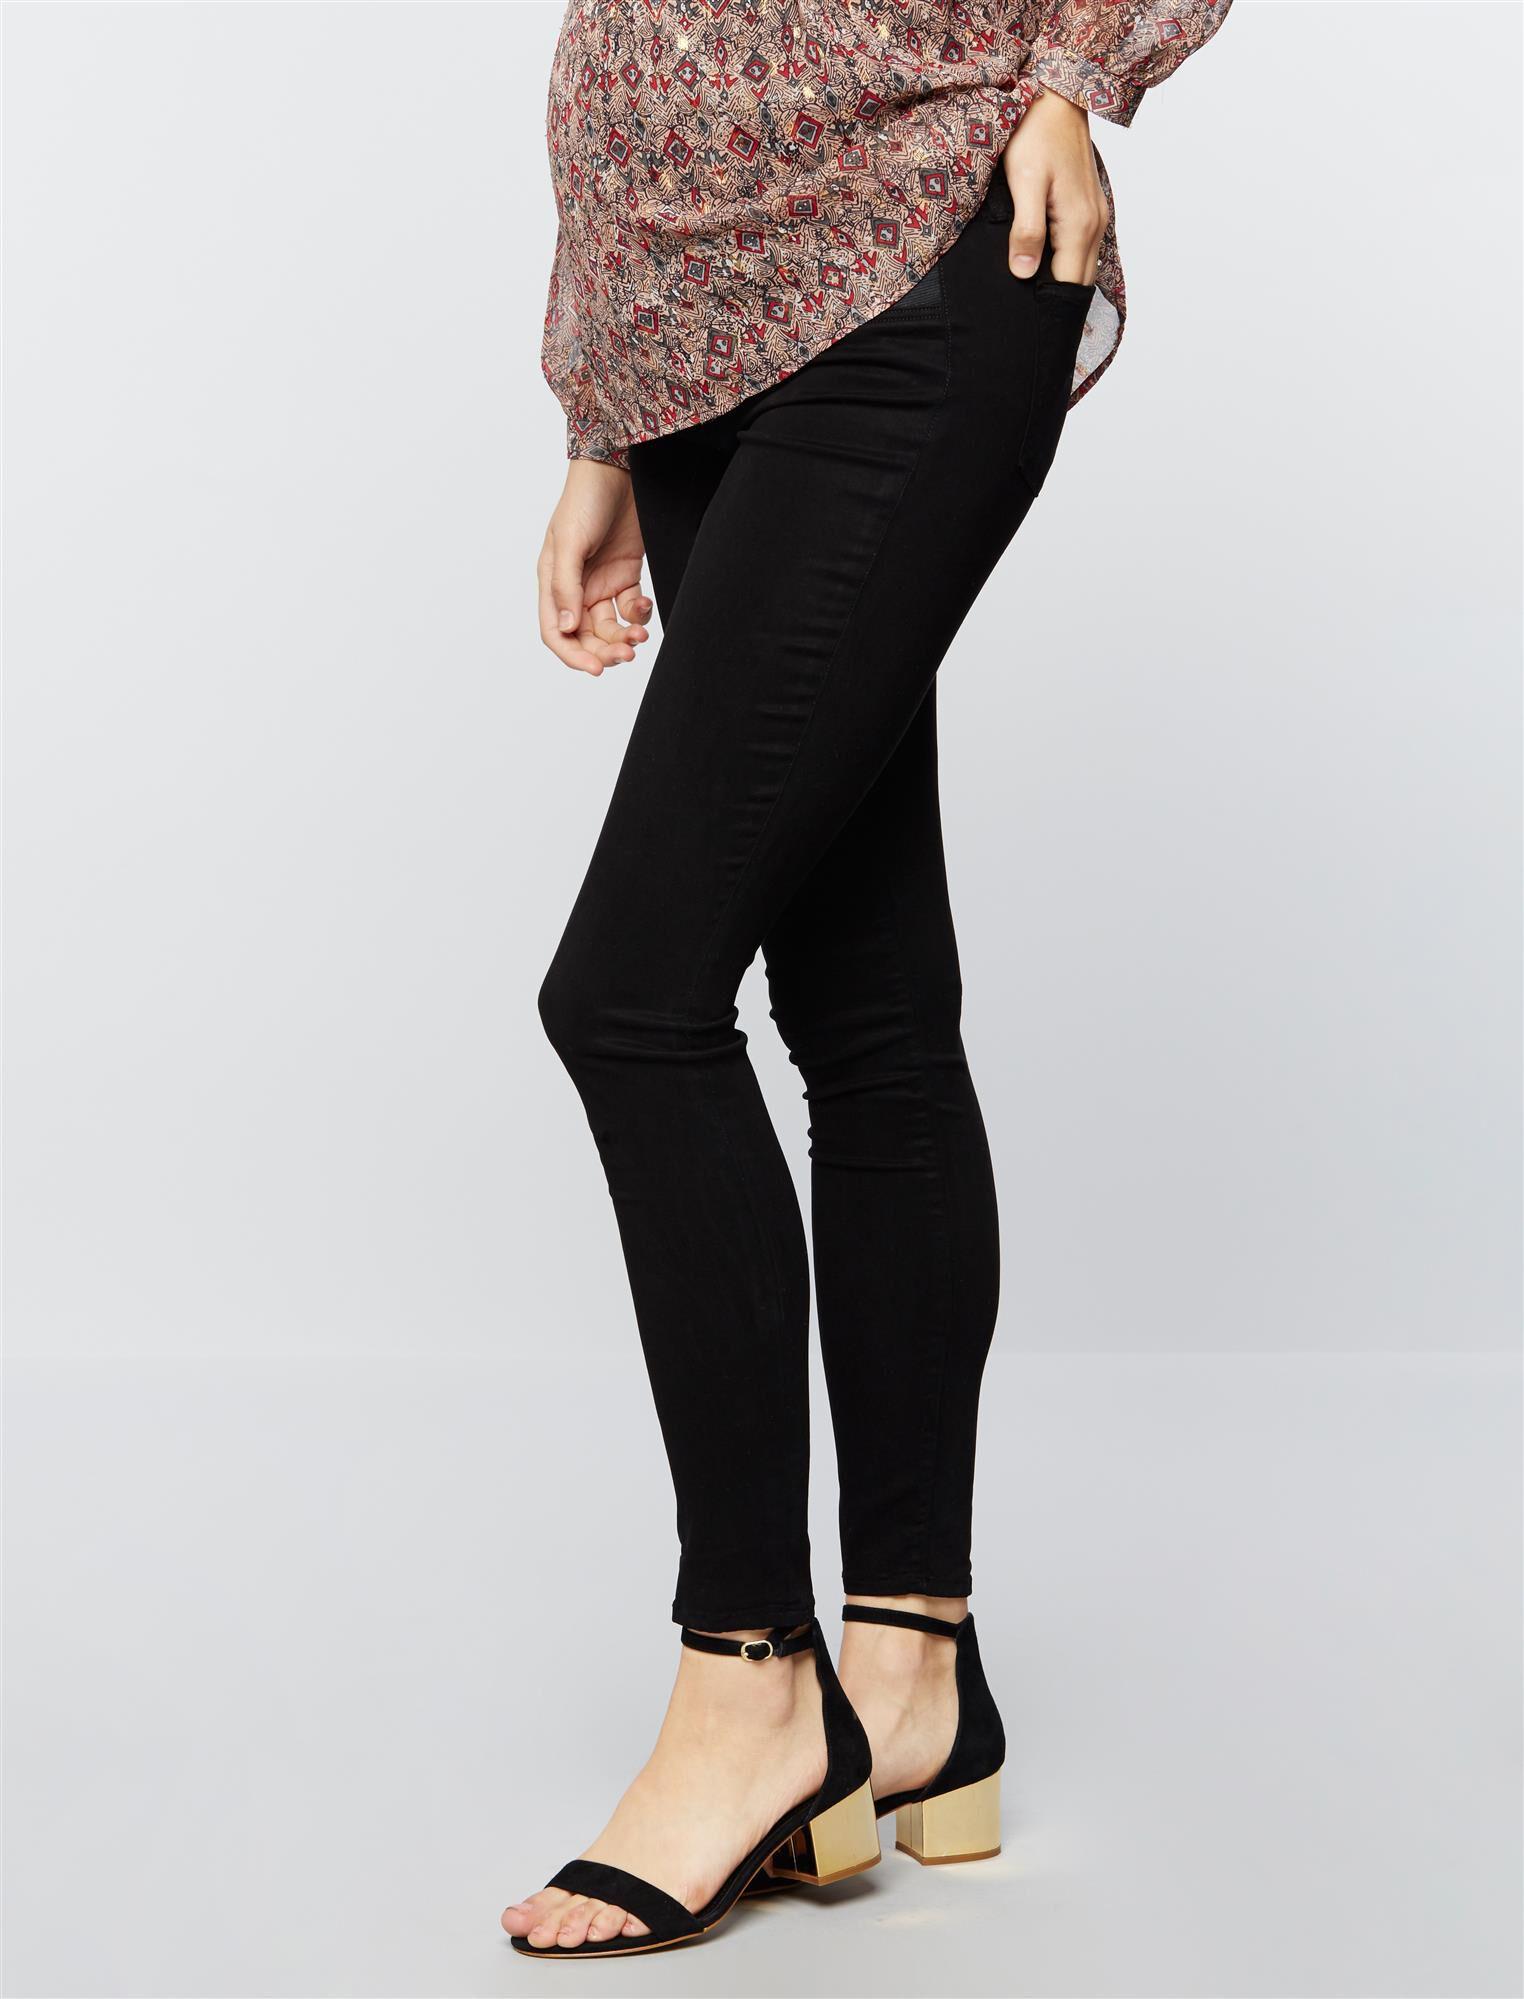 J Brand Under Belly Mama J Super Skinny Maternity Jeans- Black